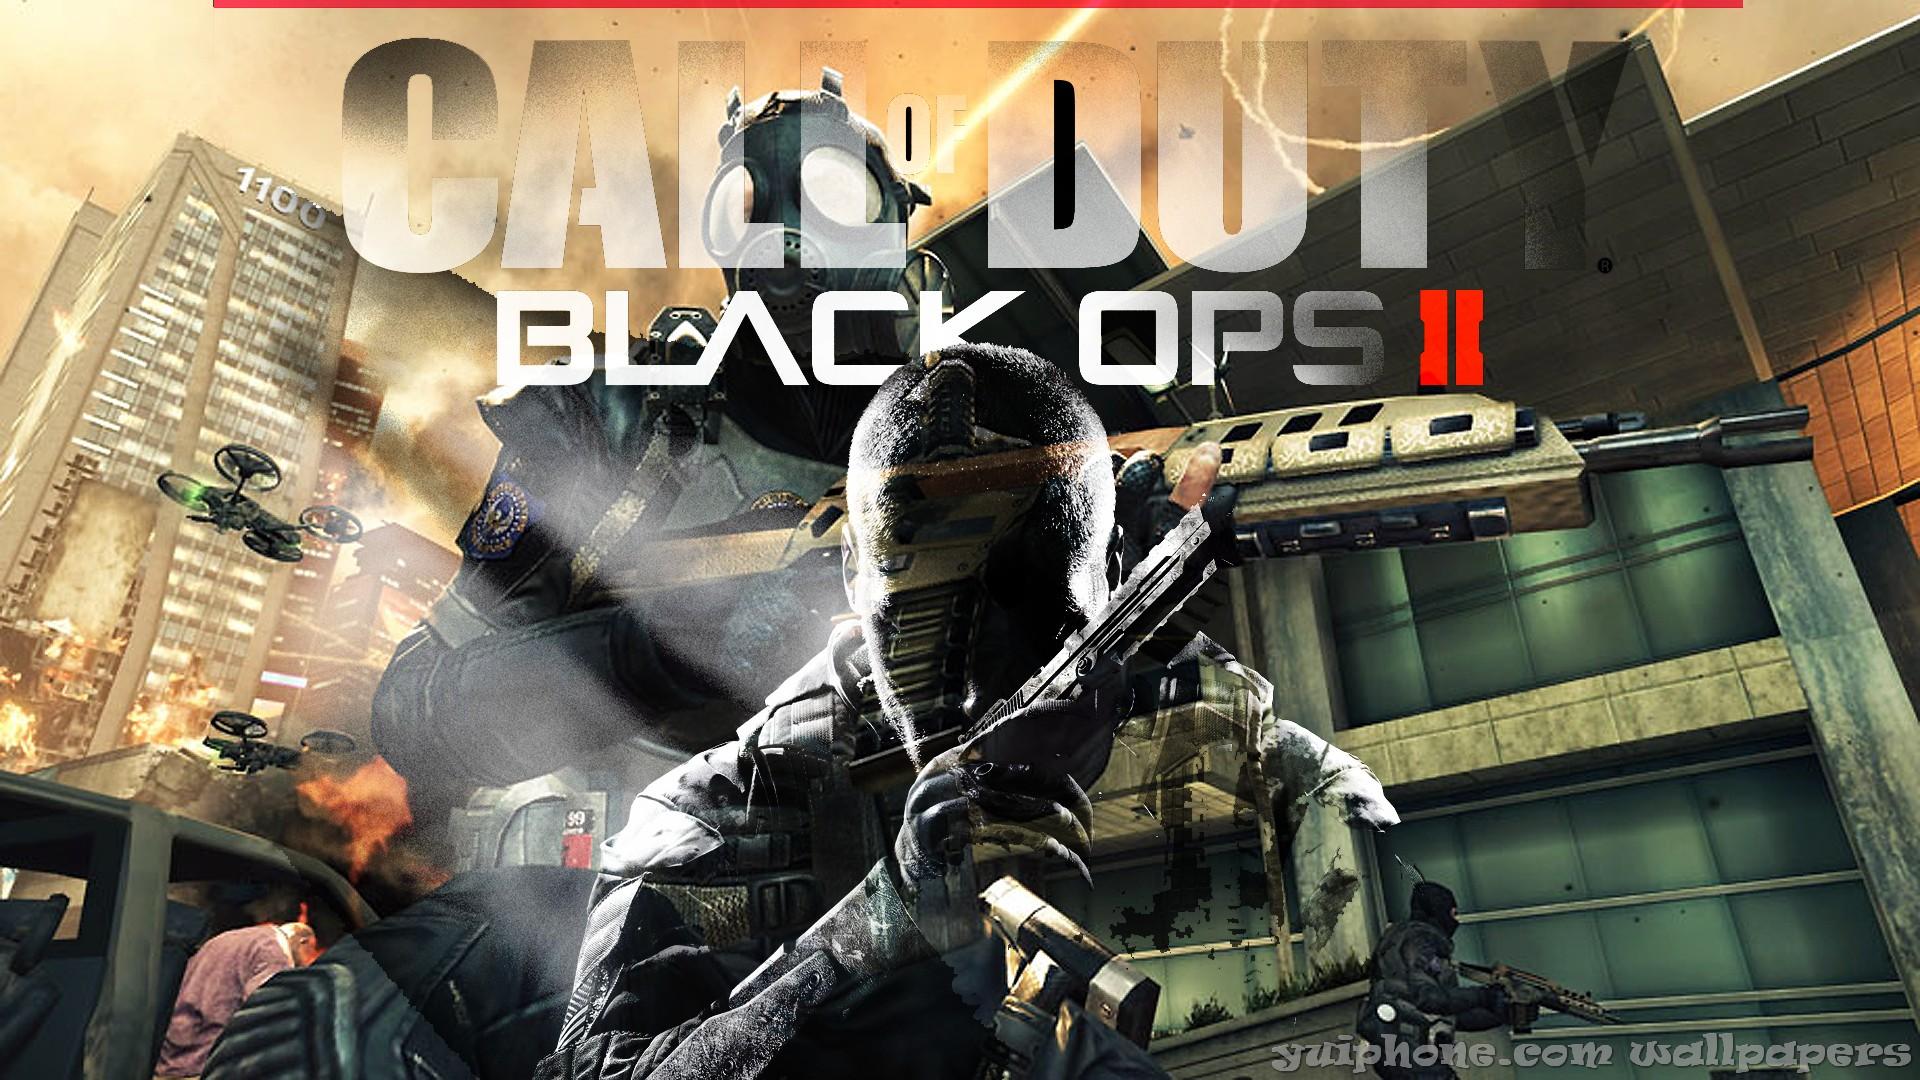 50+] Black Ops 2 HD Wallpaper on WallpaperSafari